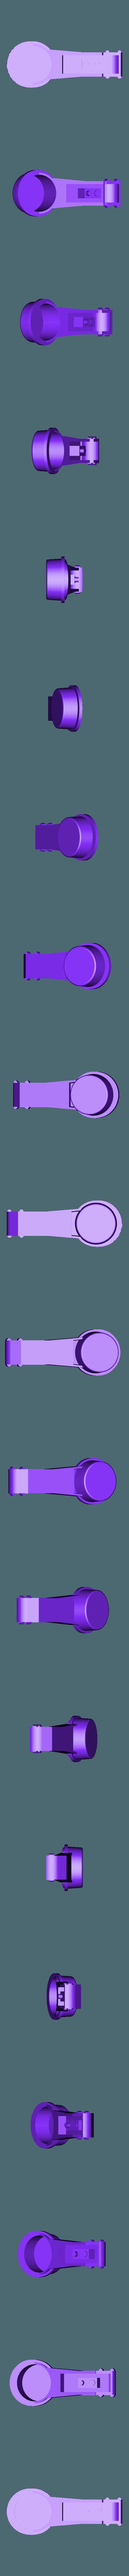 "Auslöse-Hebel_für_ein_SodaStream_EASY.stl Download free STL file Release Lever for ""SodaStream EASY"" • 3D print object, dede67"